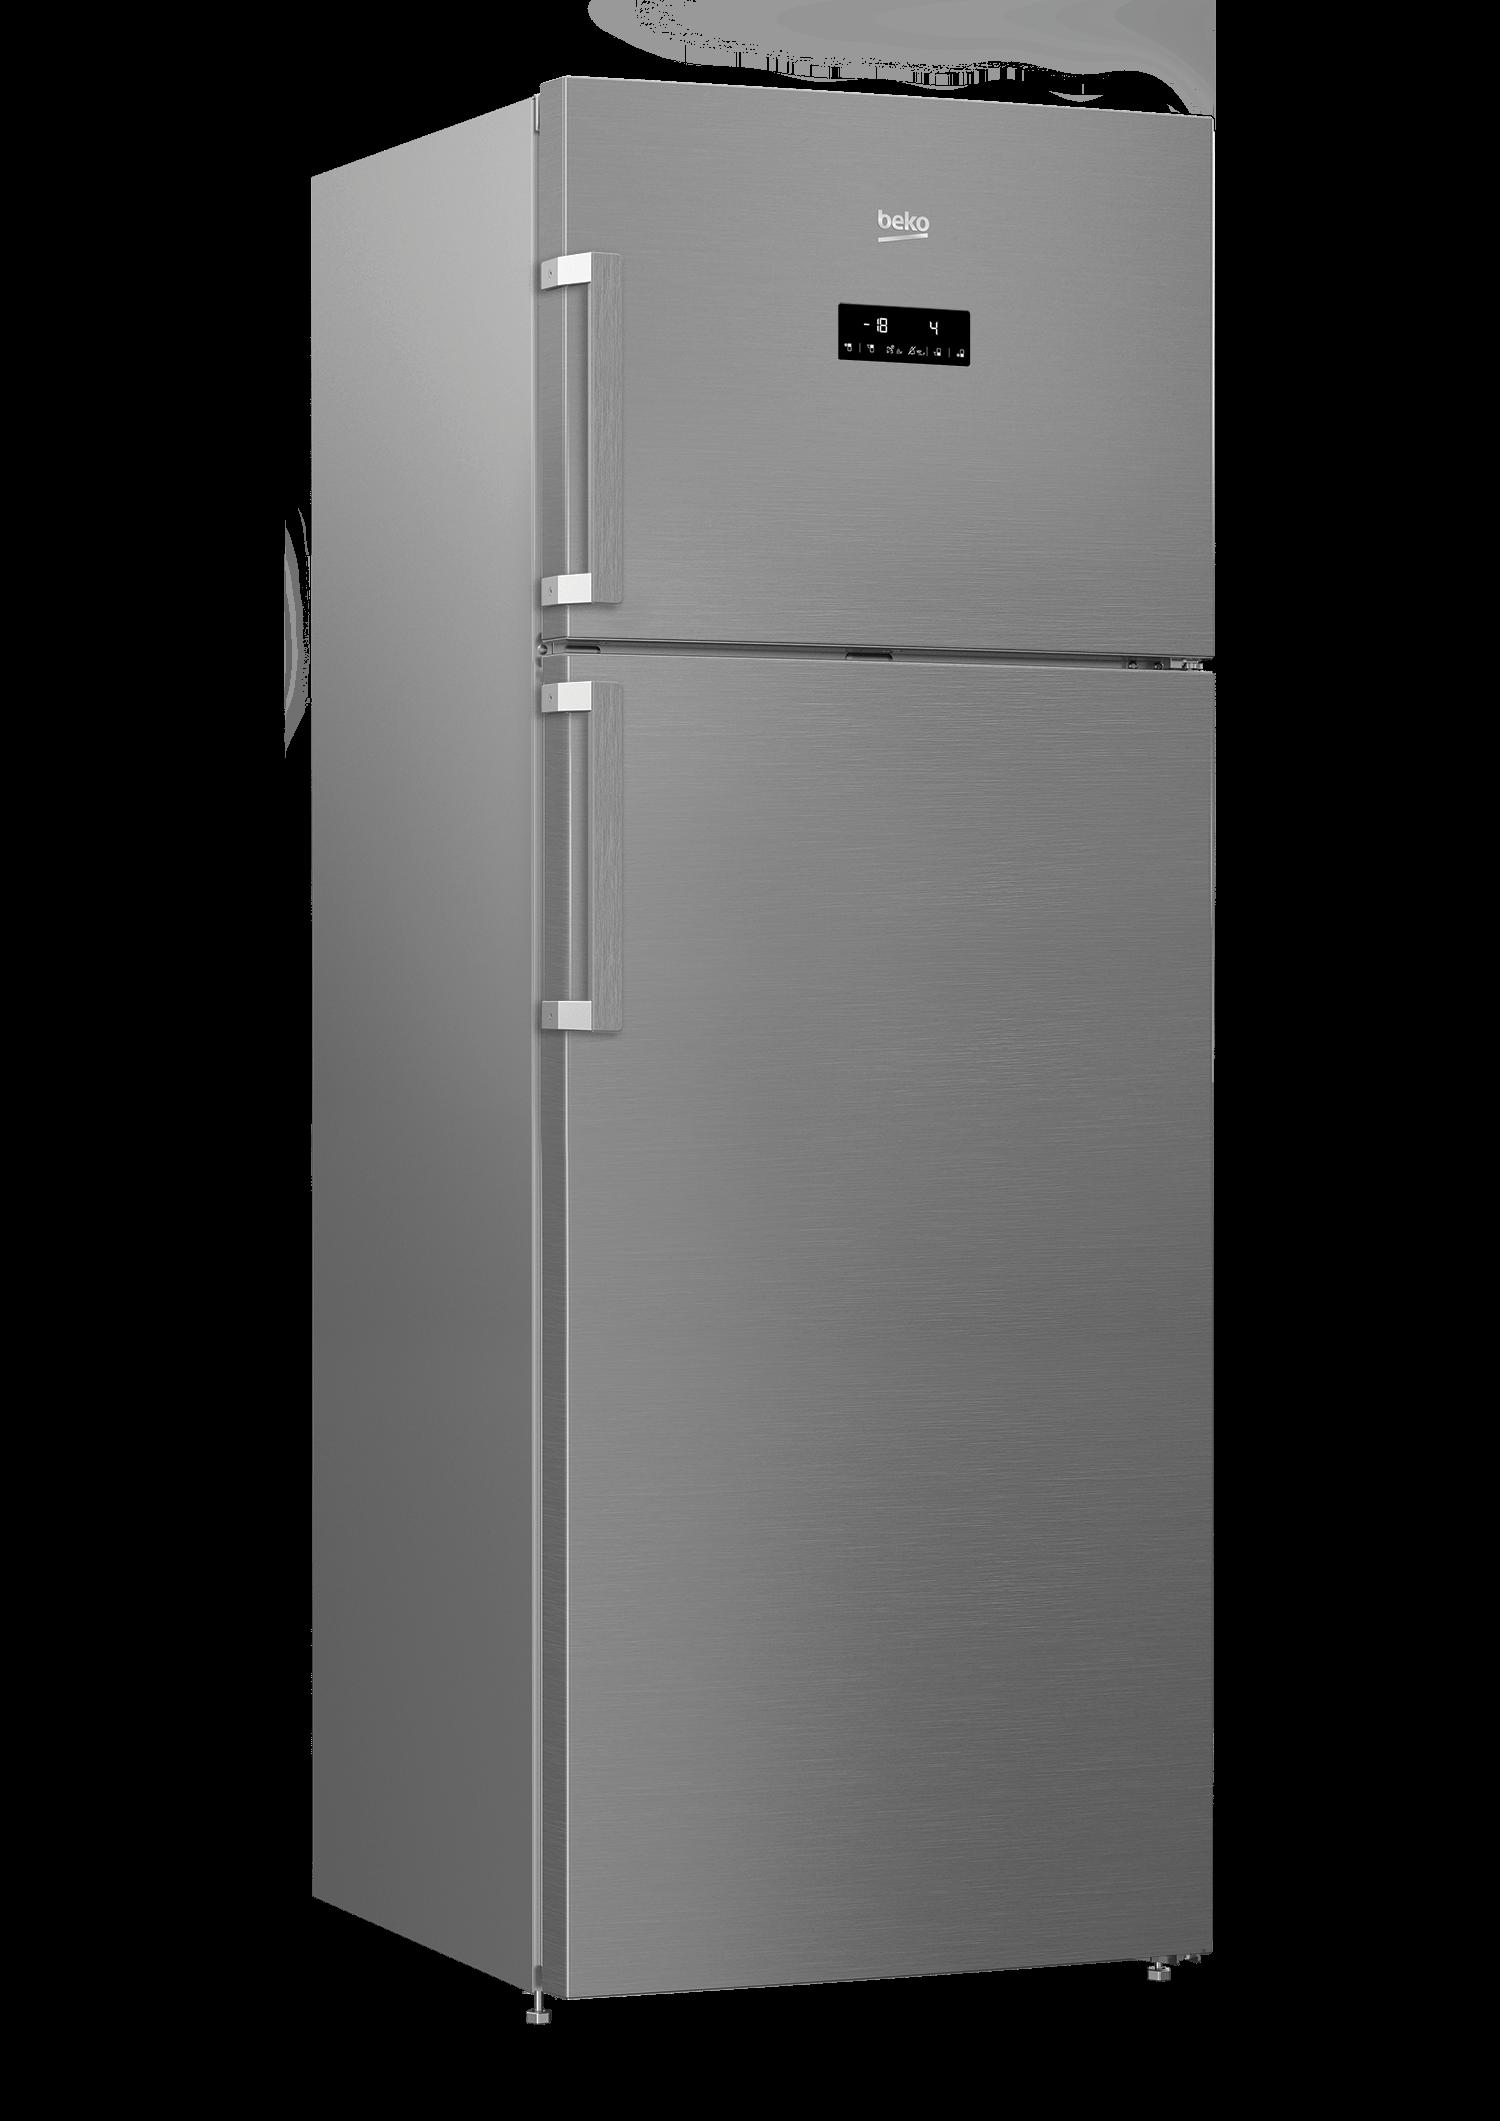 BEKO 505 Liter Top Freezer Refrigerator RDNE550K21ZPX